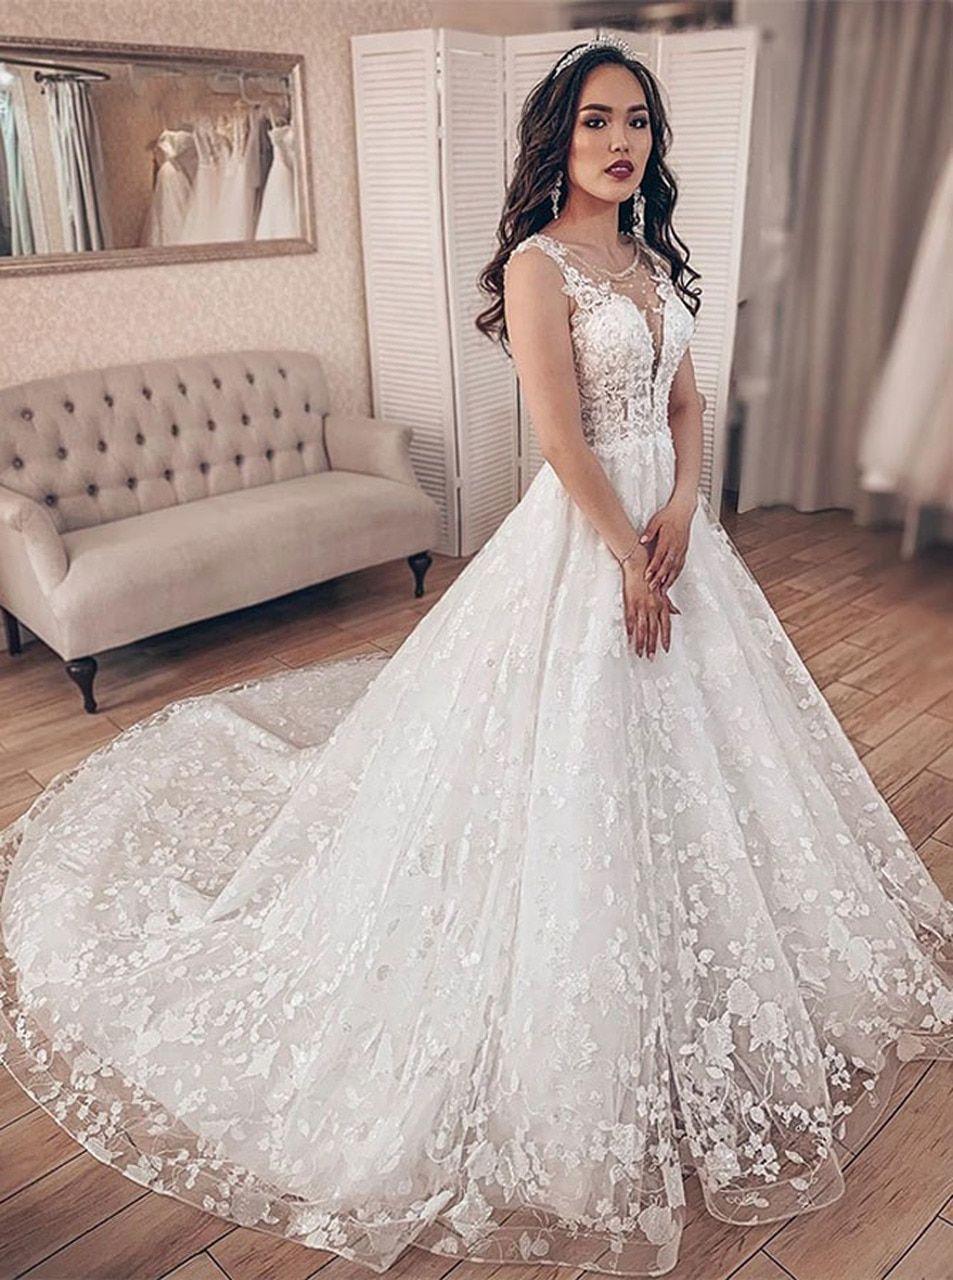 Princess Lace Wedding Dress Stunning Bridal Gown 12222 Wedding Dresses Lace Bridal Gowns A Line Bridal Gowns [ jpg ]